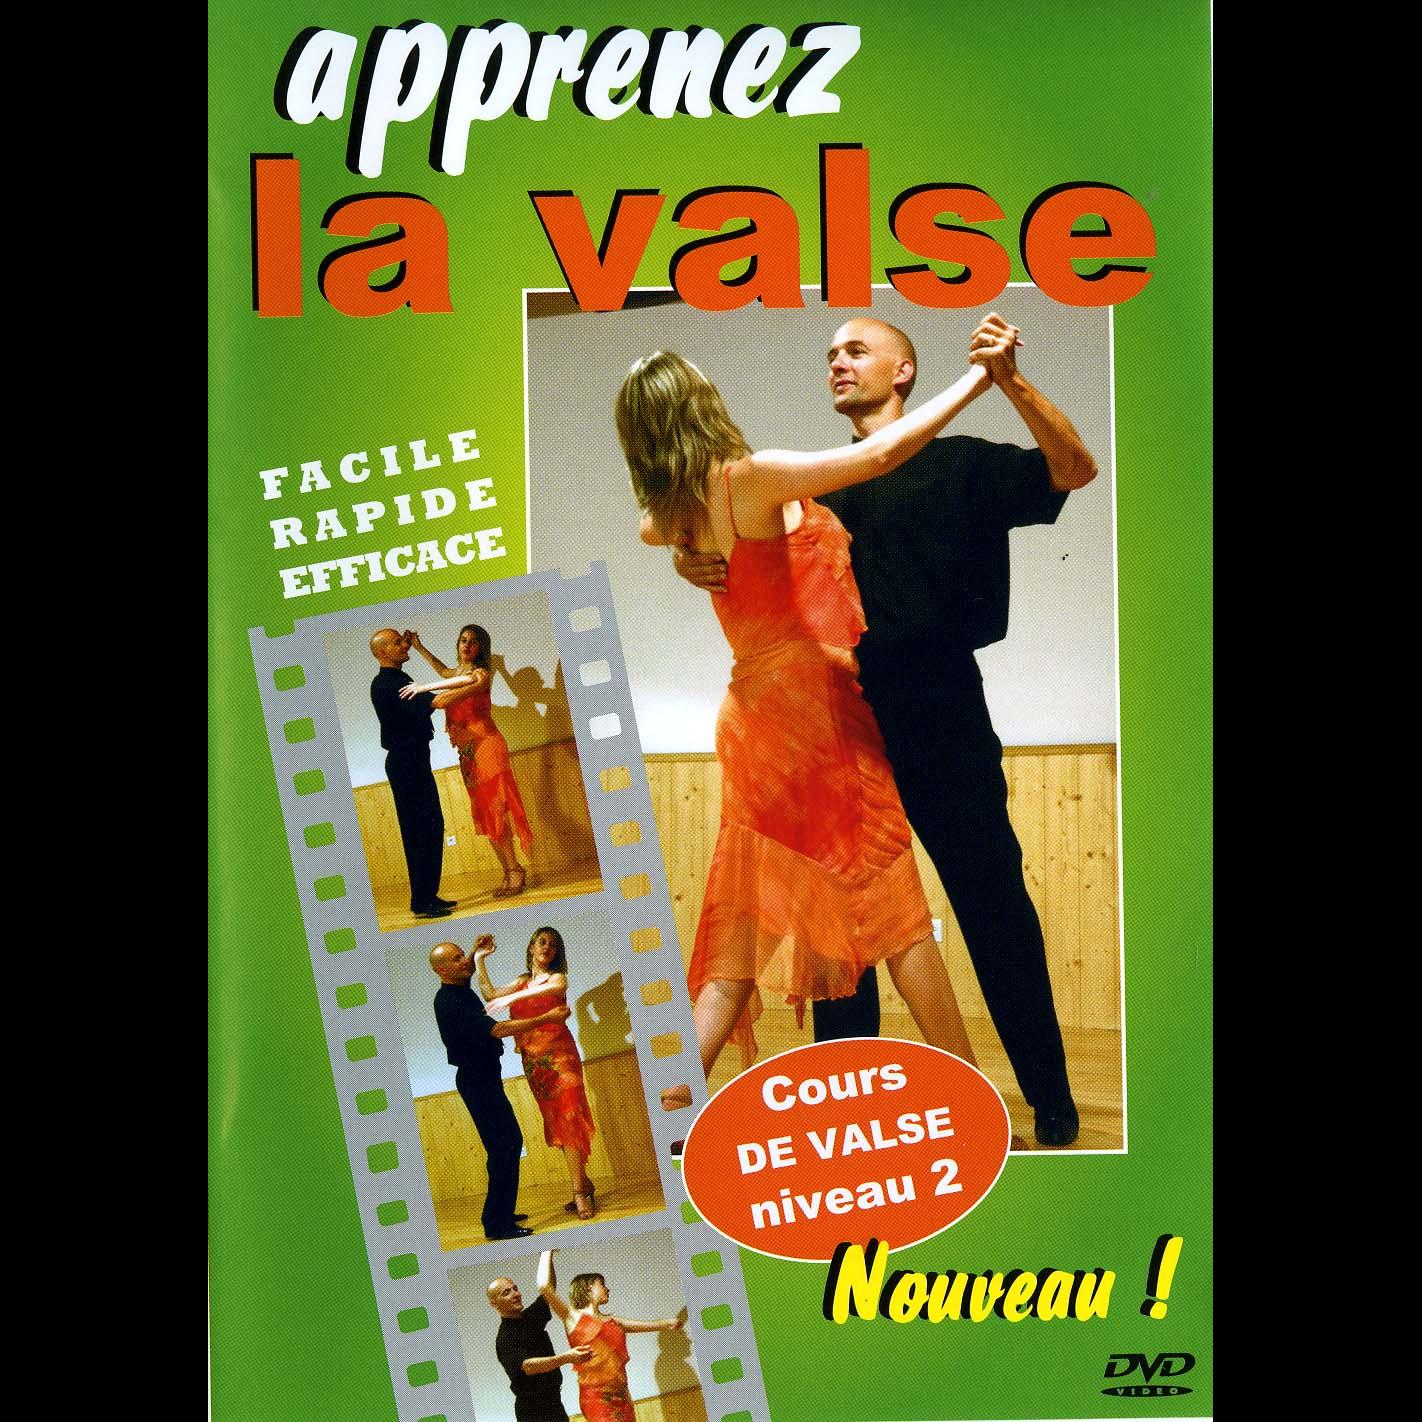 APPRENEZ LA VALSE COURS MOYEN DVD JP116, danceworld bruxelles